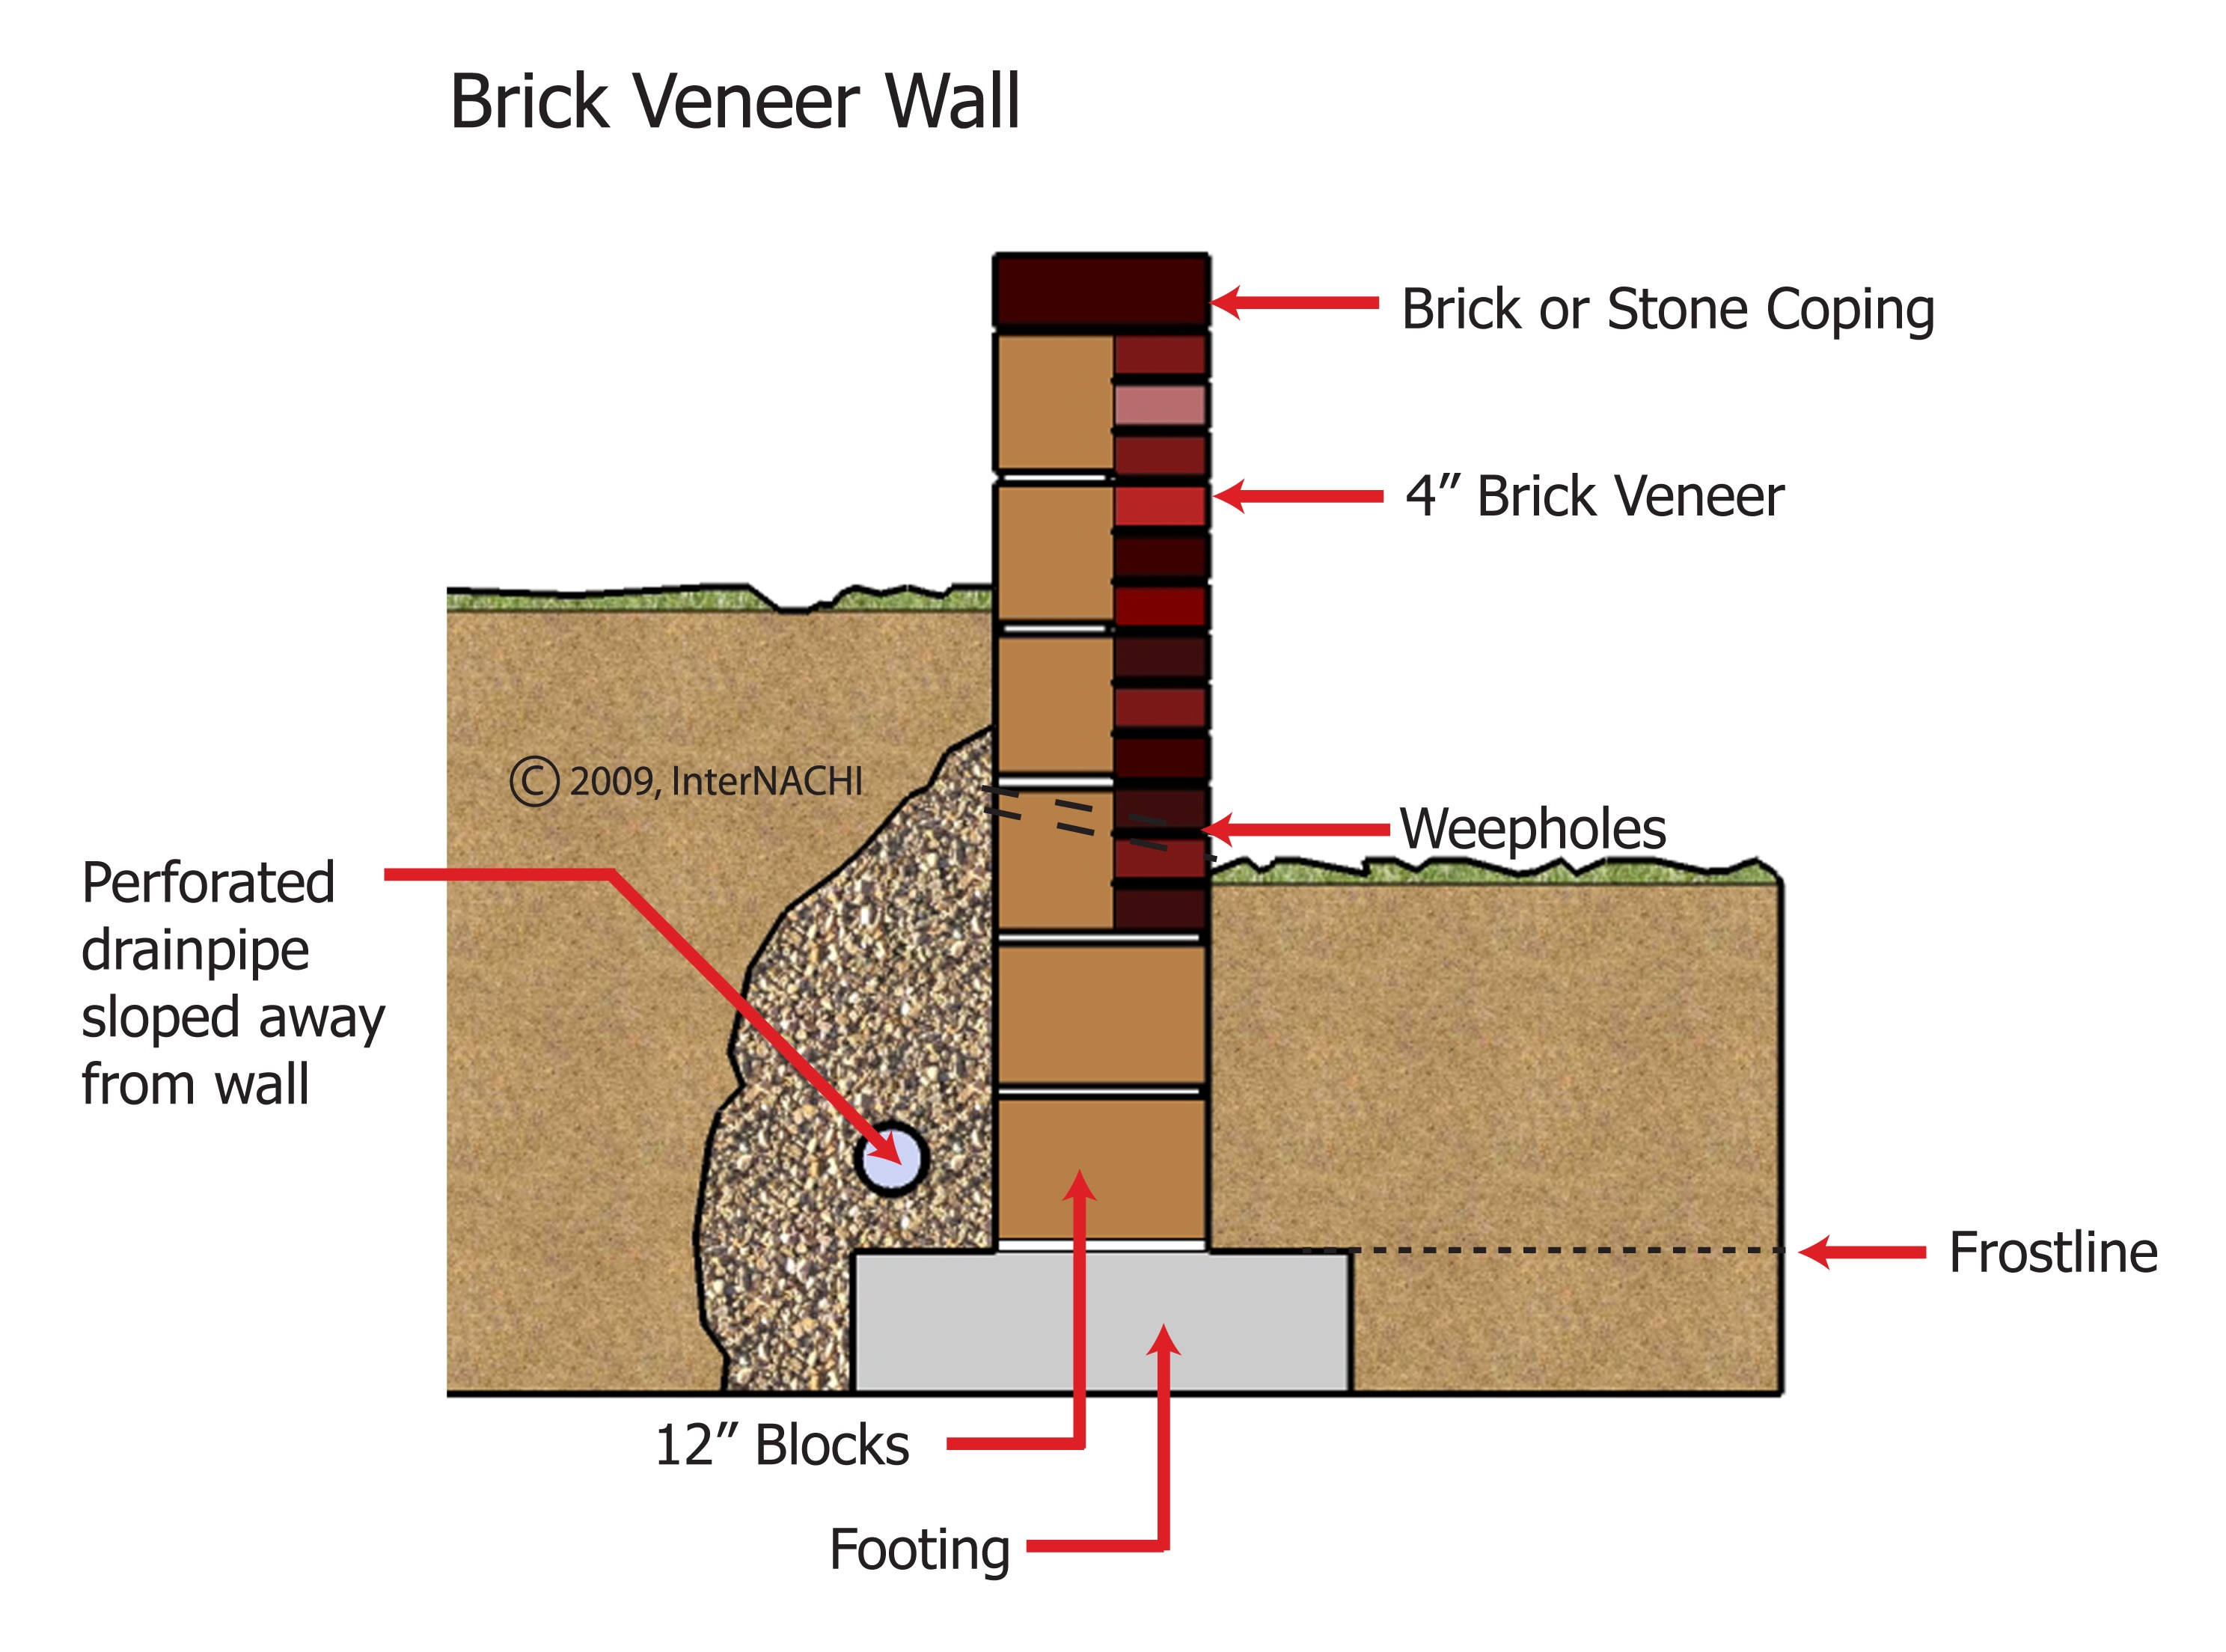 Brick veneer wall.